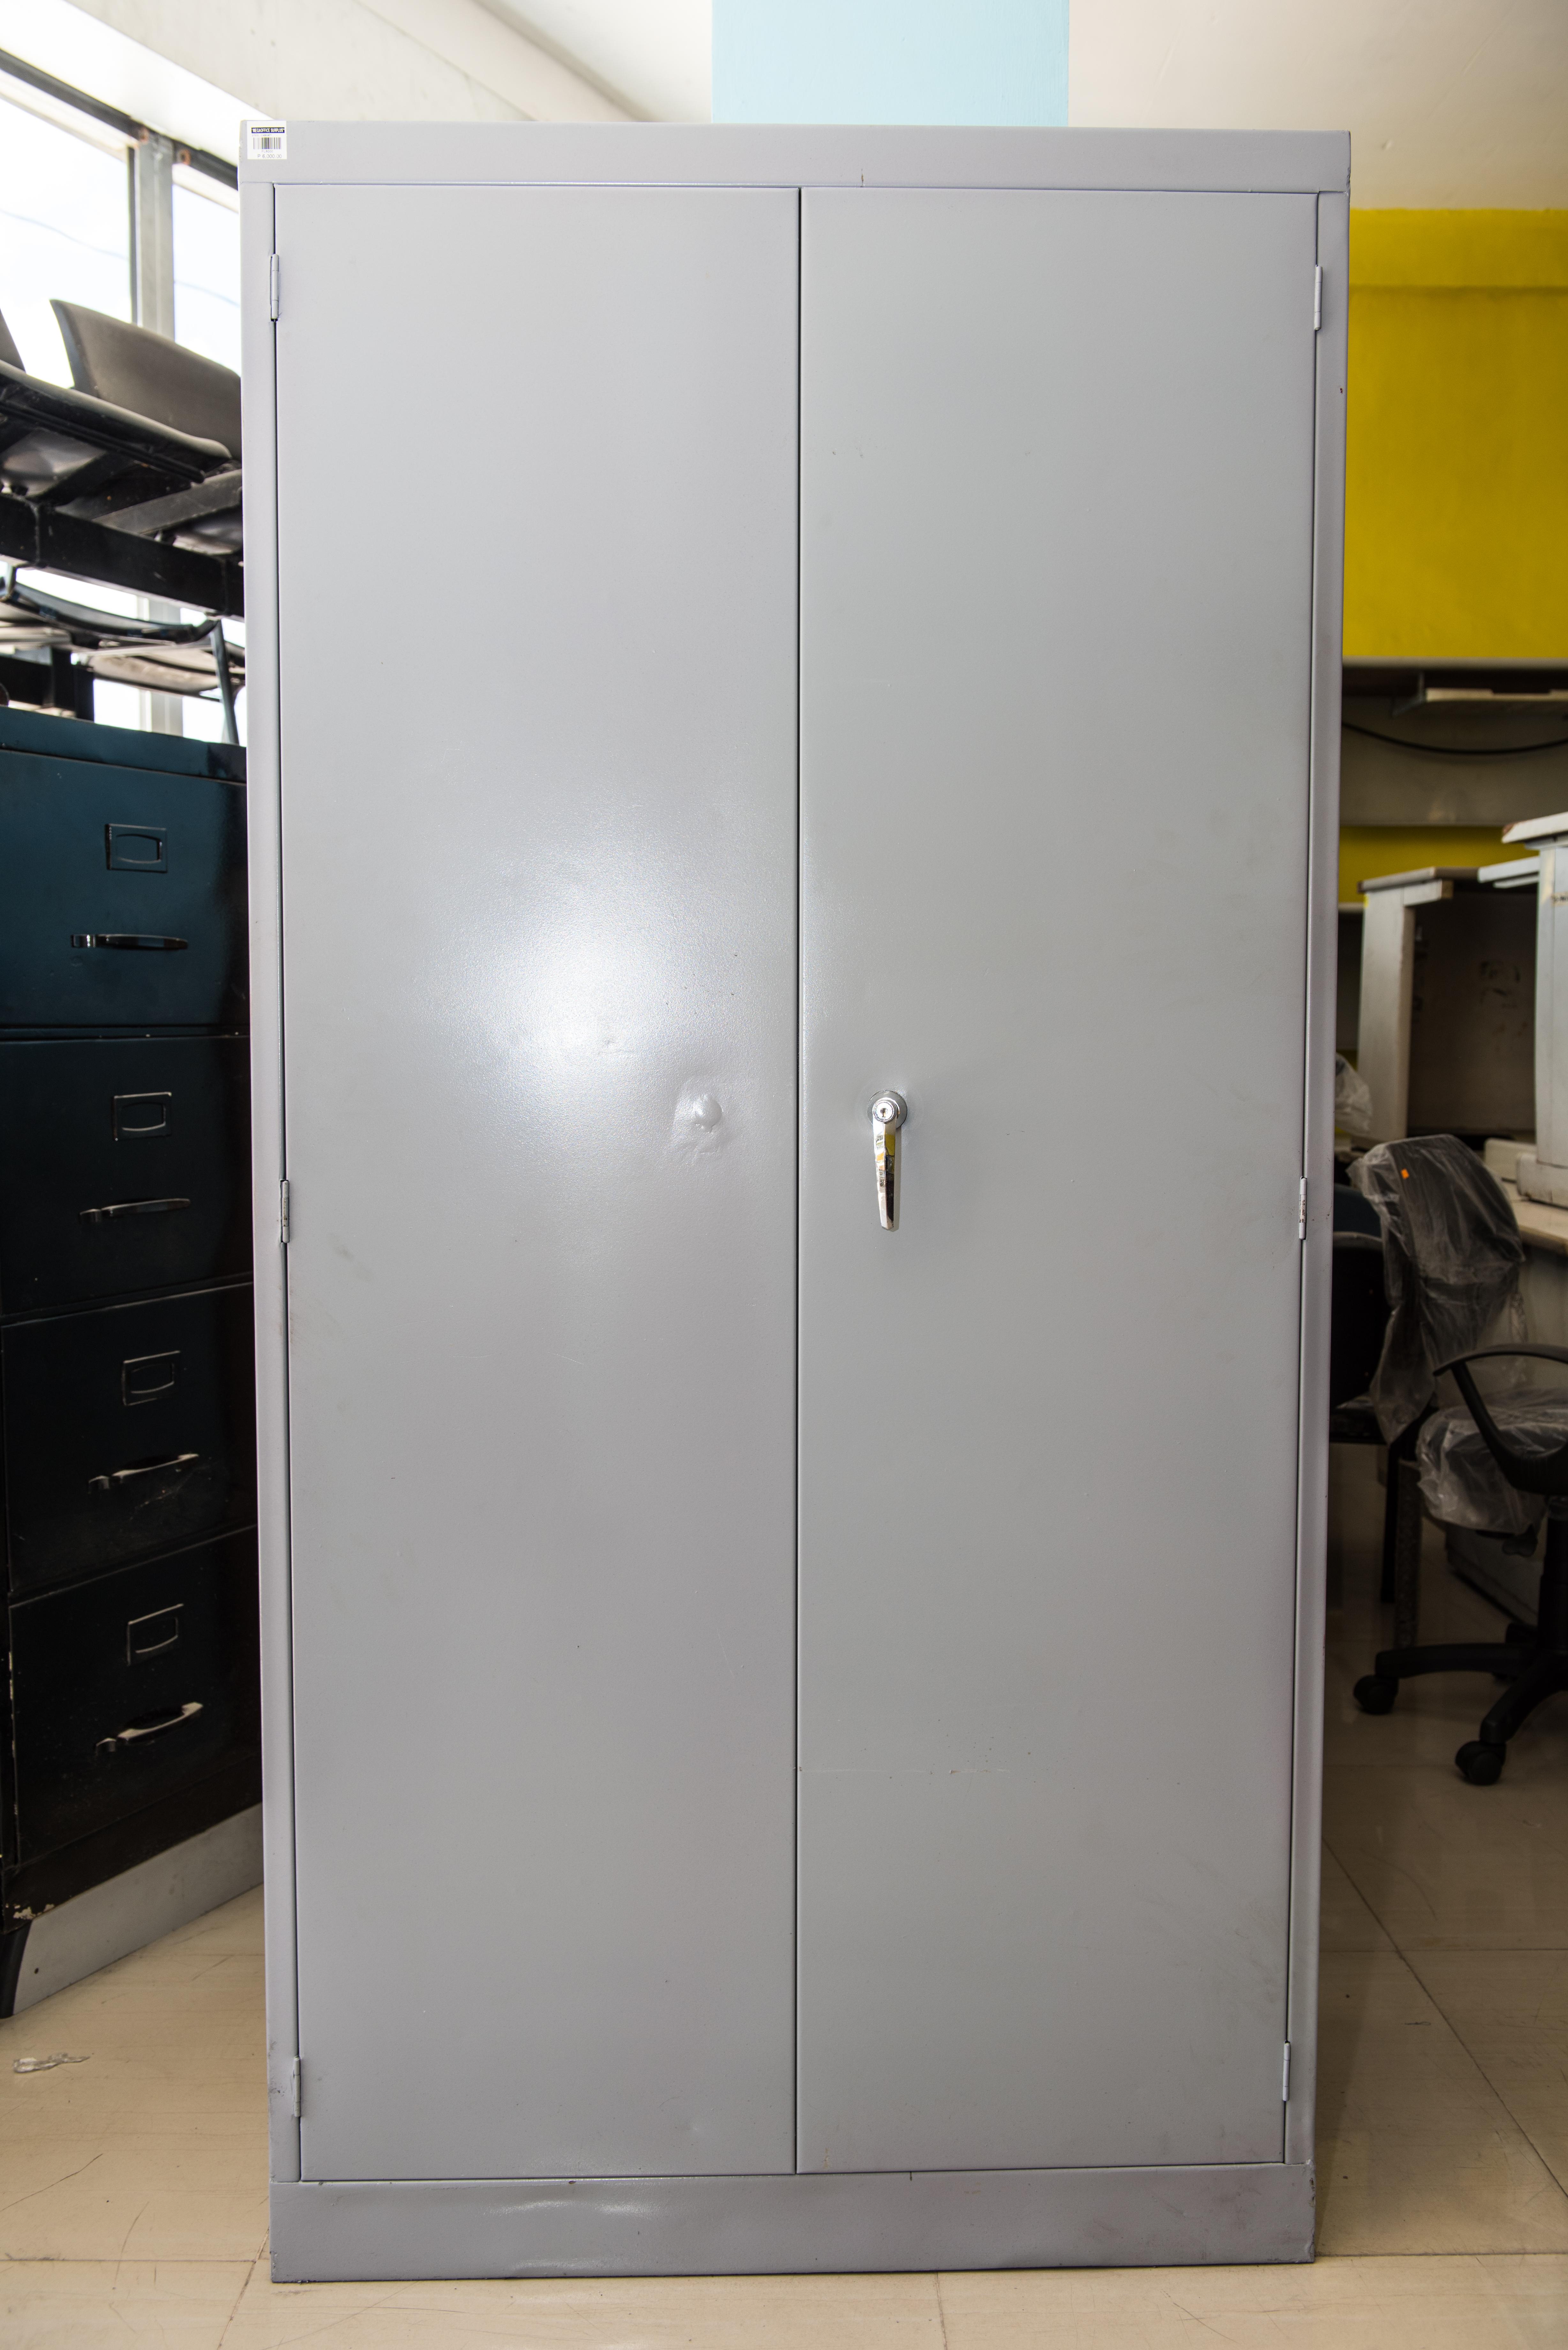 Megaoffice Surplus Storage Cabinet